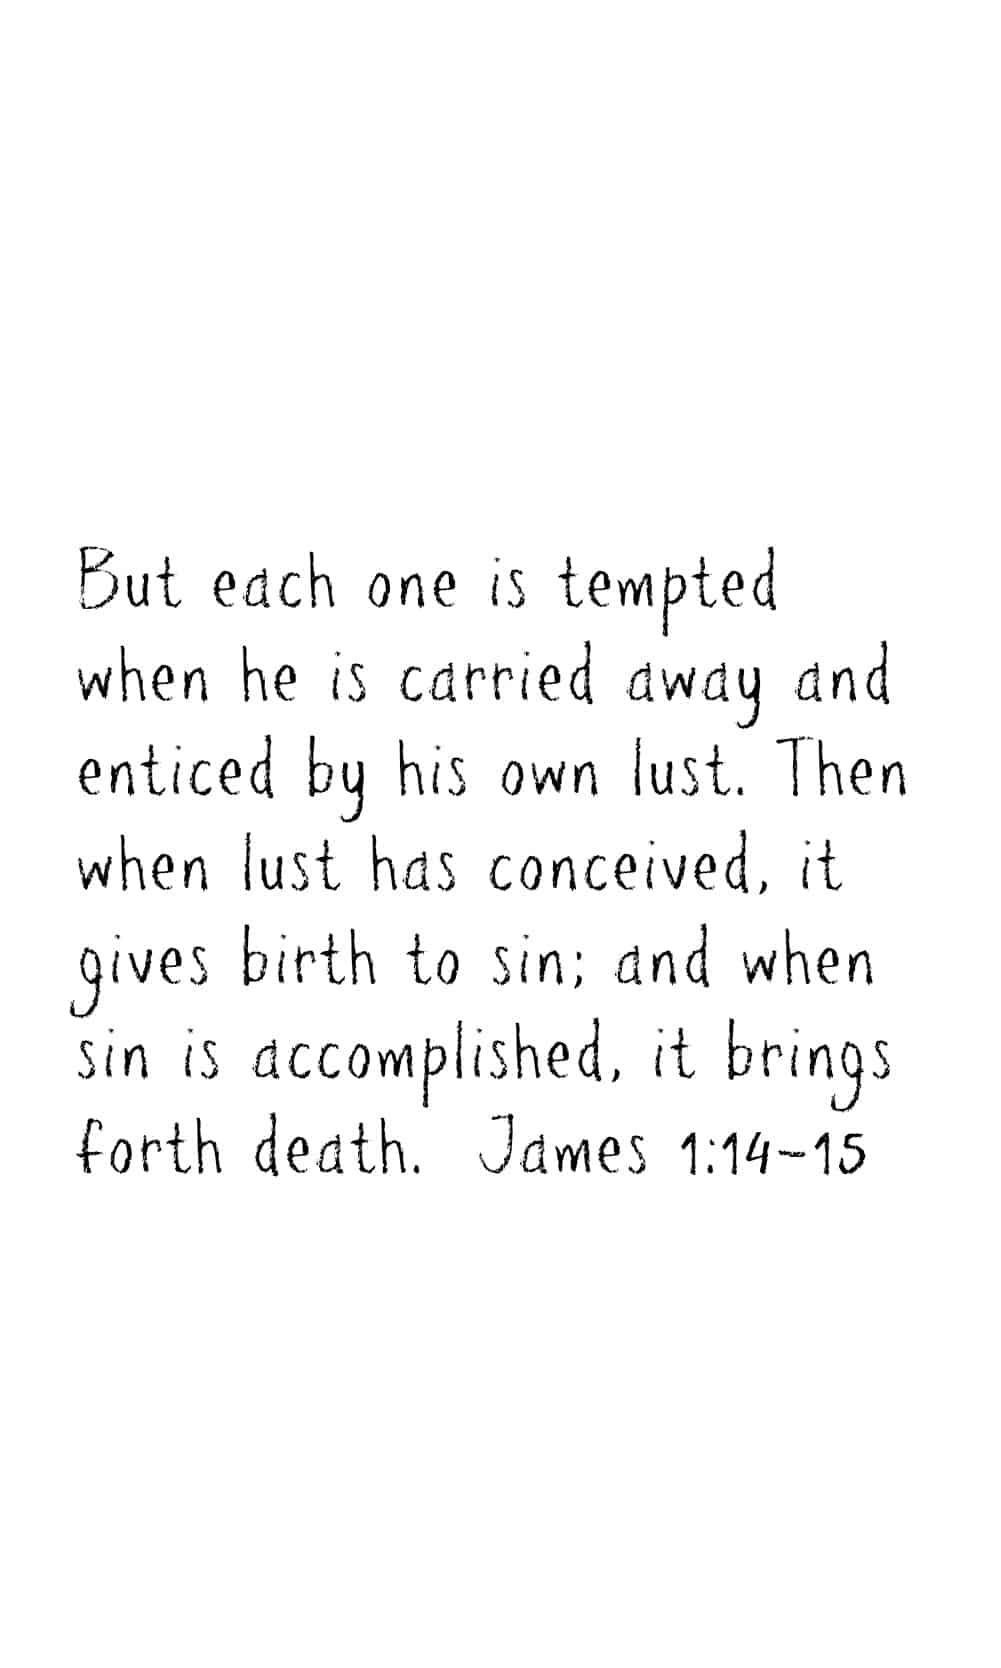 Scripture Memory Wallpaper for iPhones | James 1:14-15